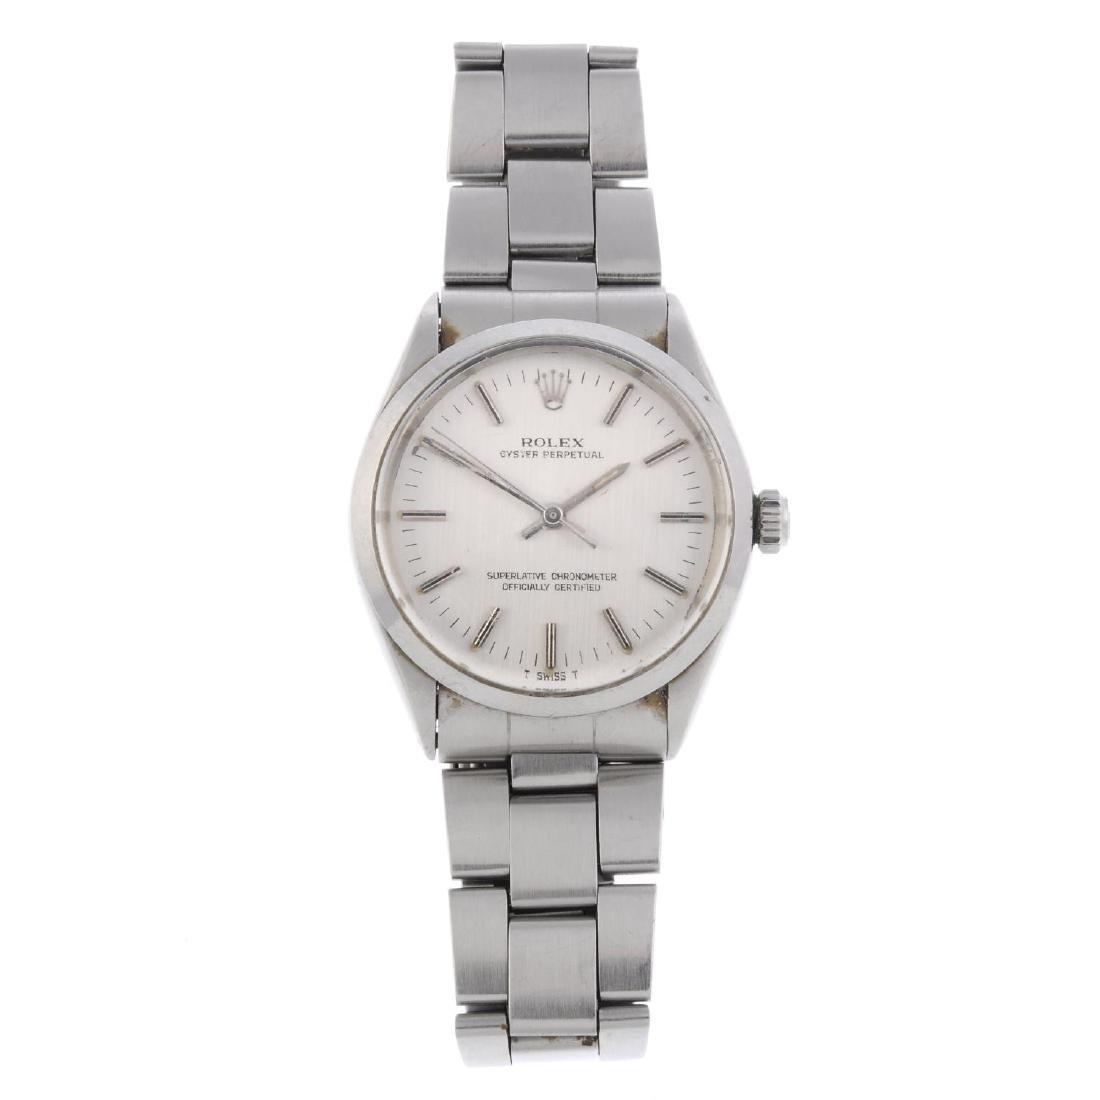 ROLEX - a gentleman's Oyster Perpetual bracelet watch.